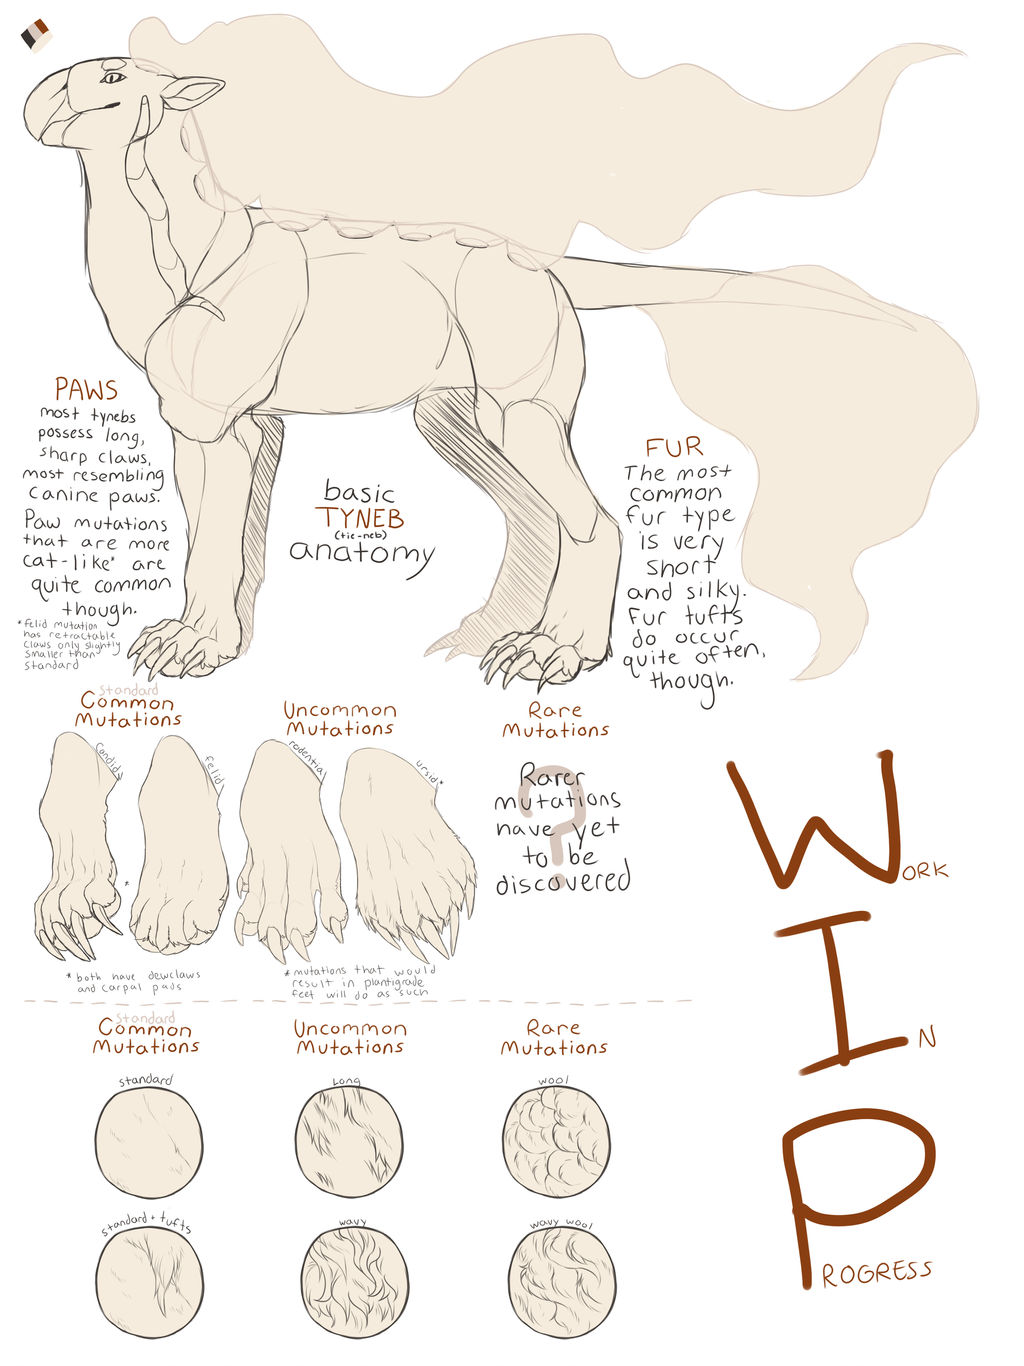 Basic Tyneb Anatomy By Mute Owl On Deviantart